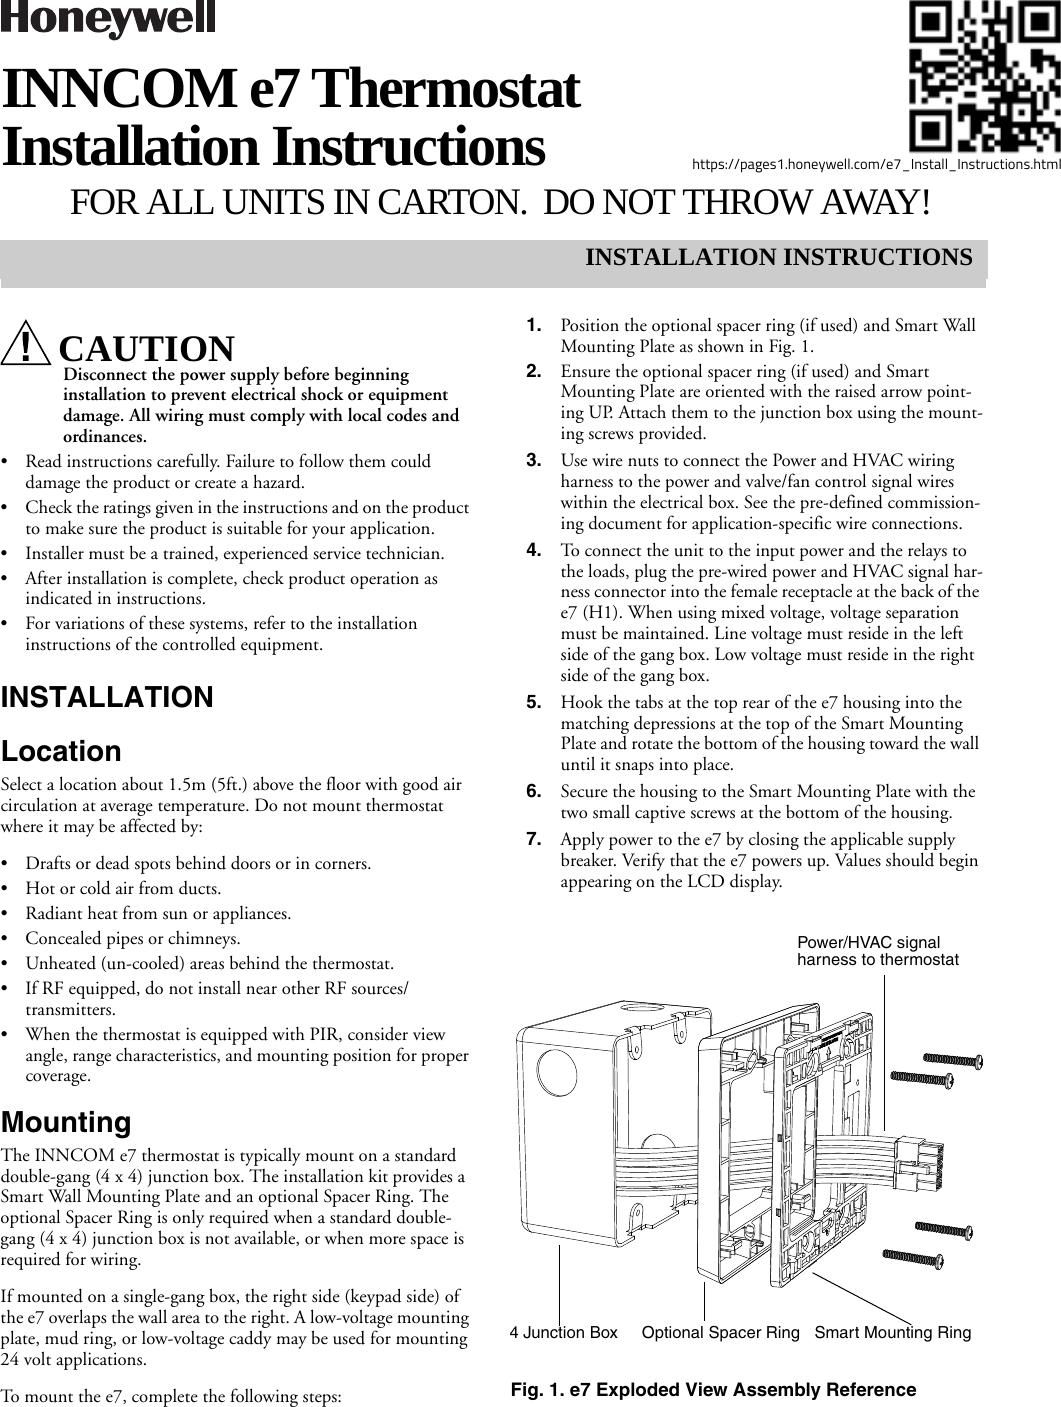 Honeywell 201528100 E7 Thermostat User Manual 31 00093 03